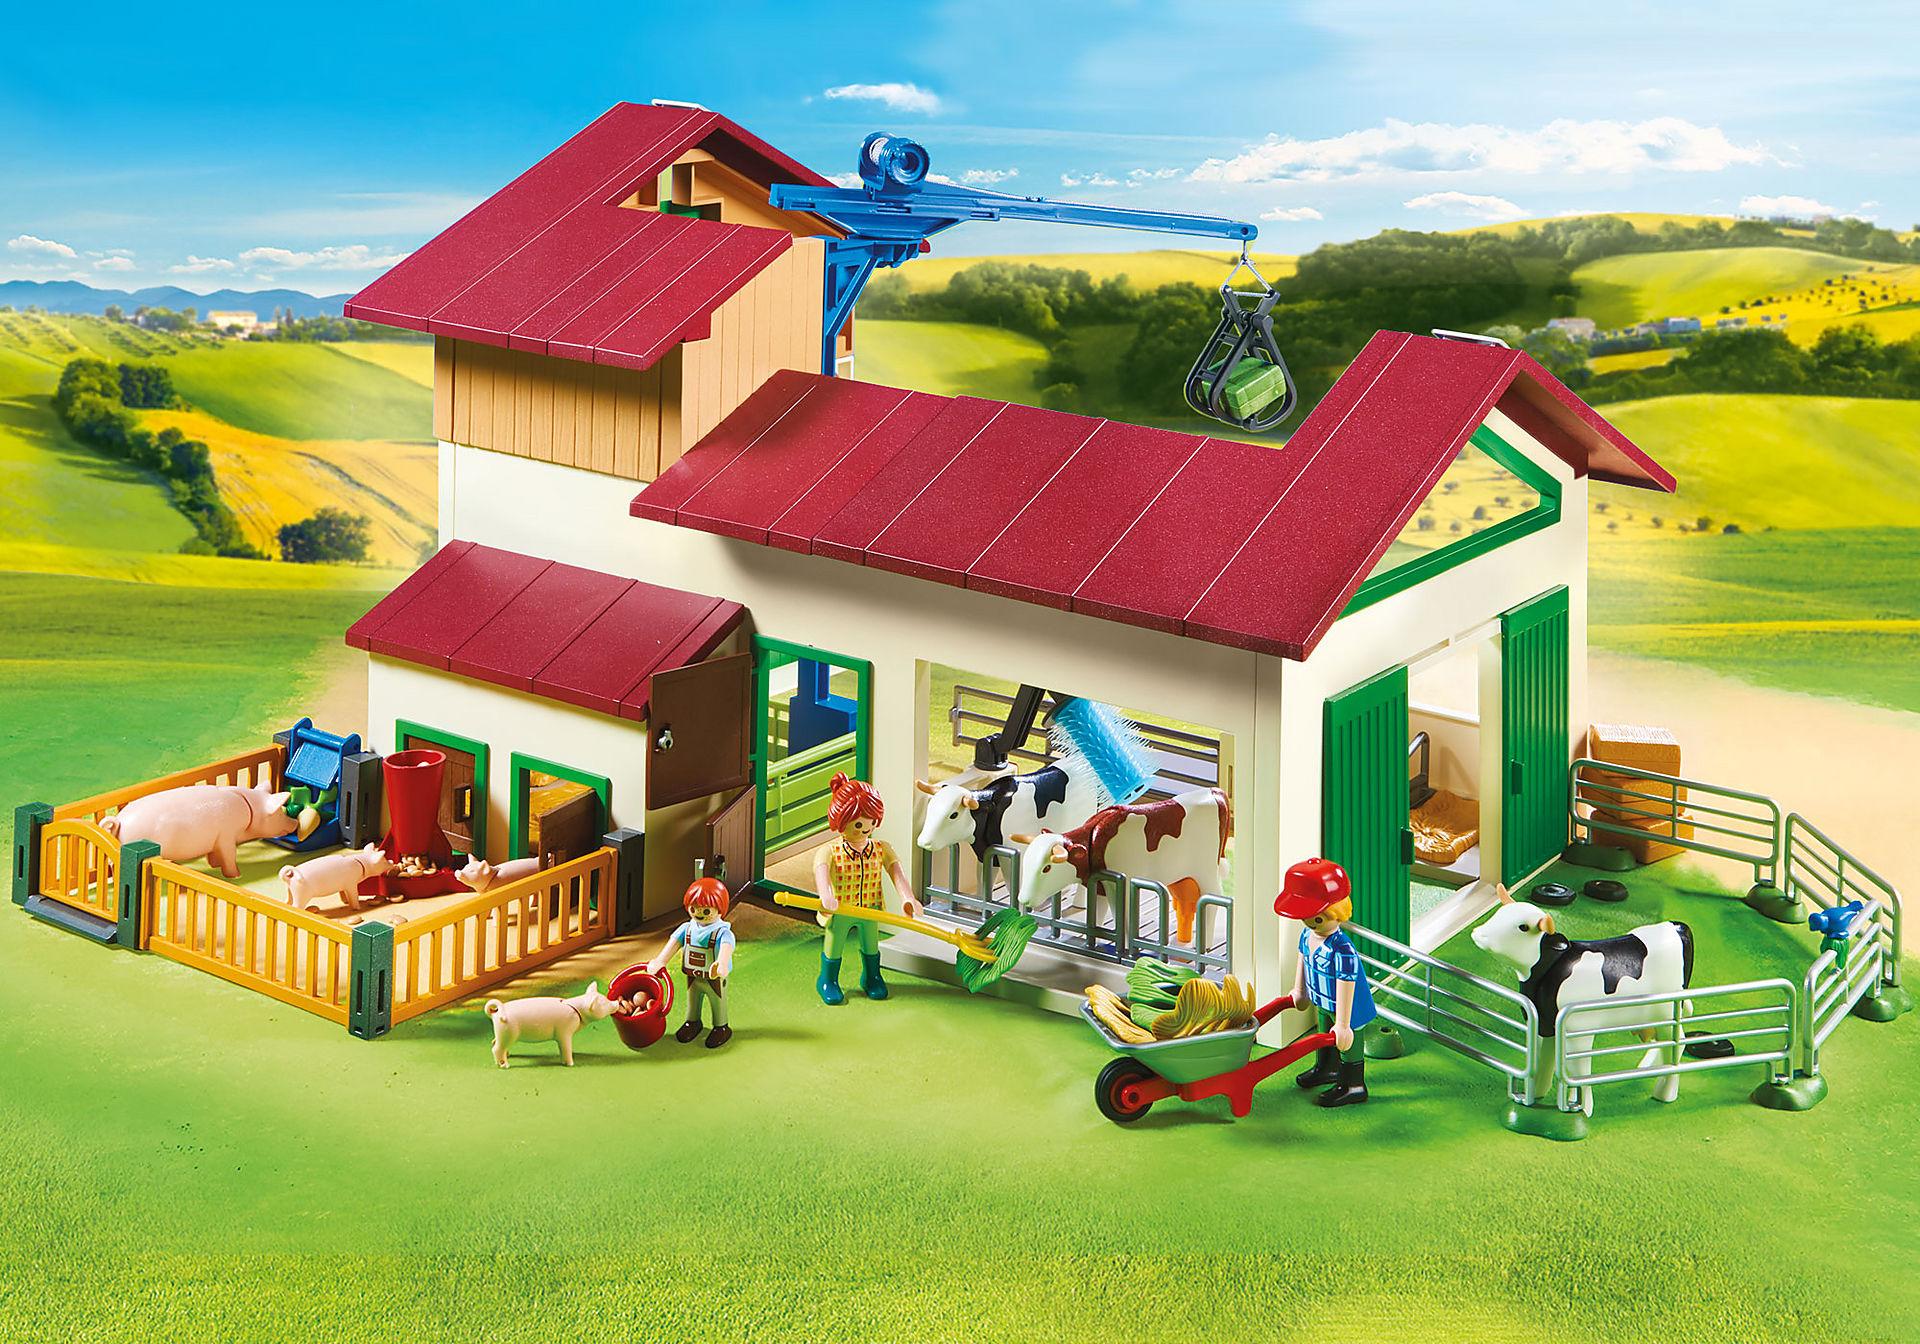 http://media.playmobil.com/i/playmobil/70132_product_extra4/Boerderij met silo en dieren